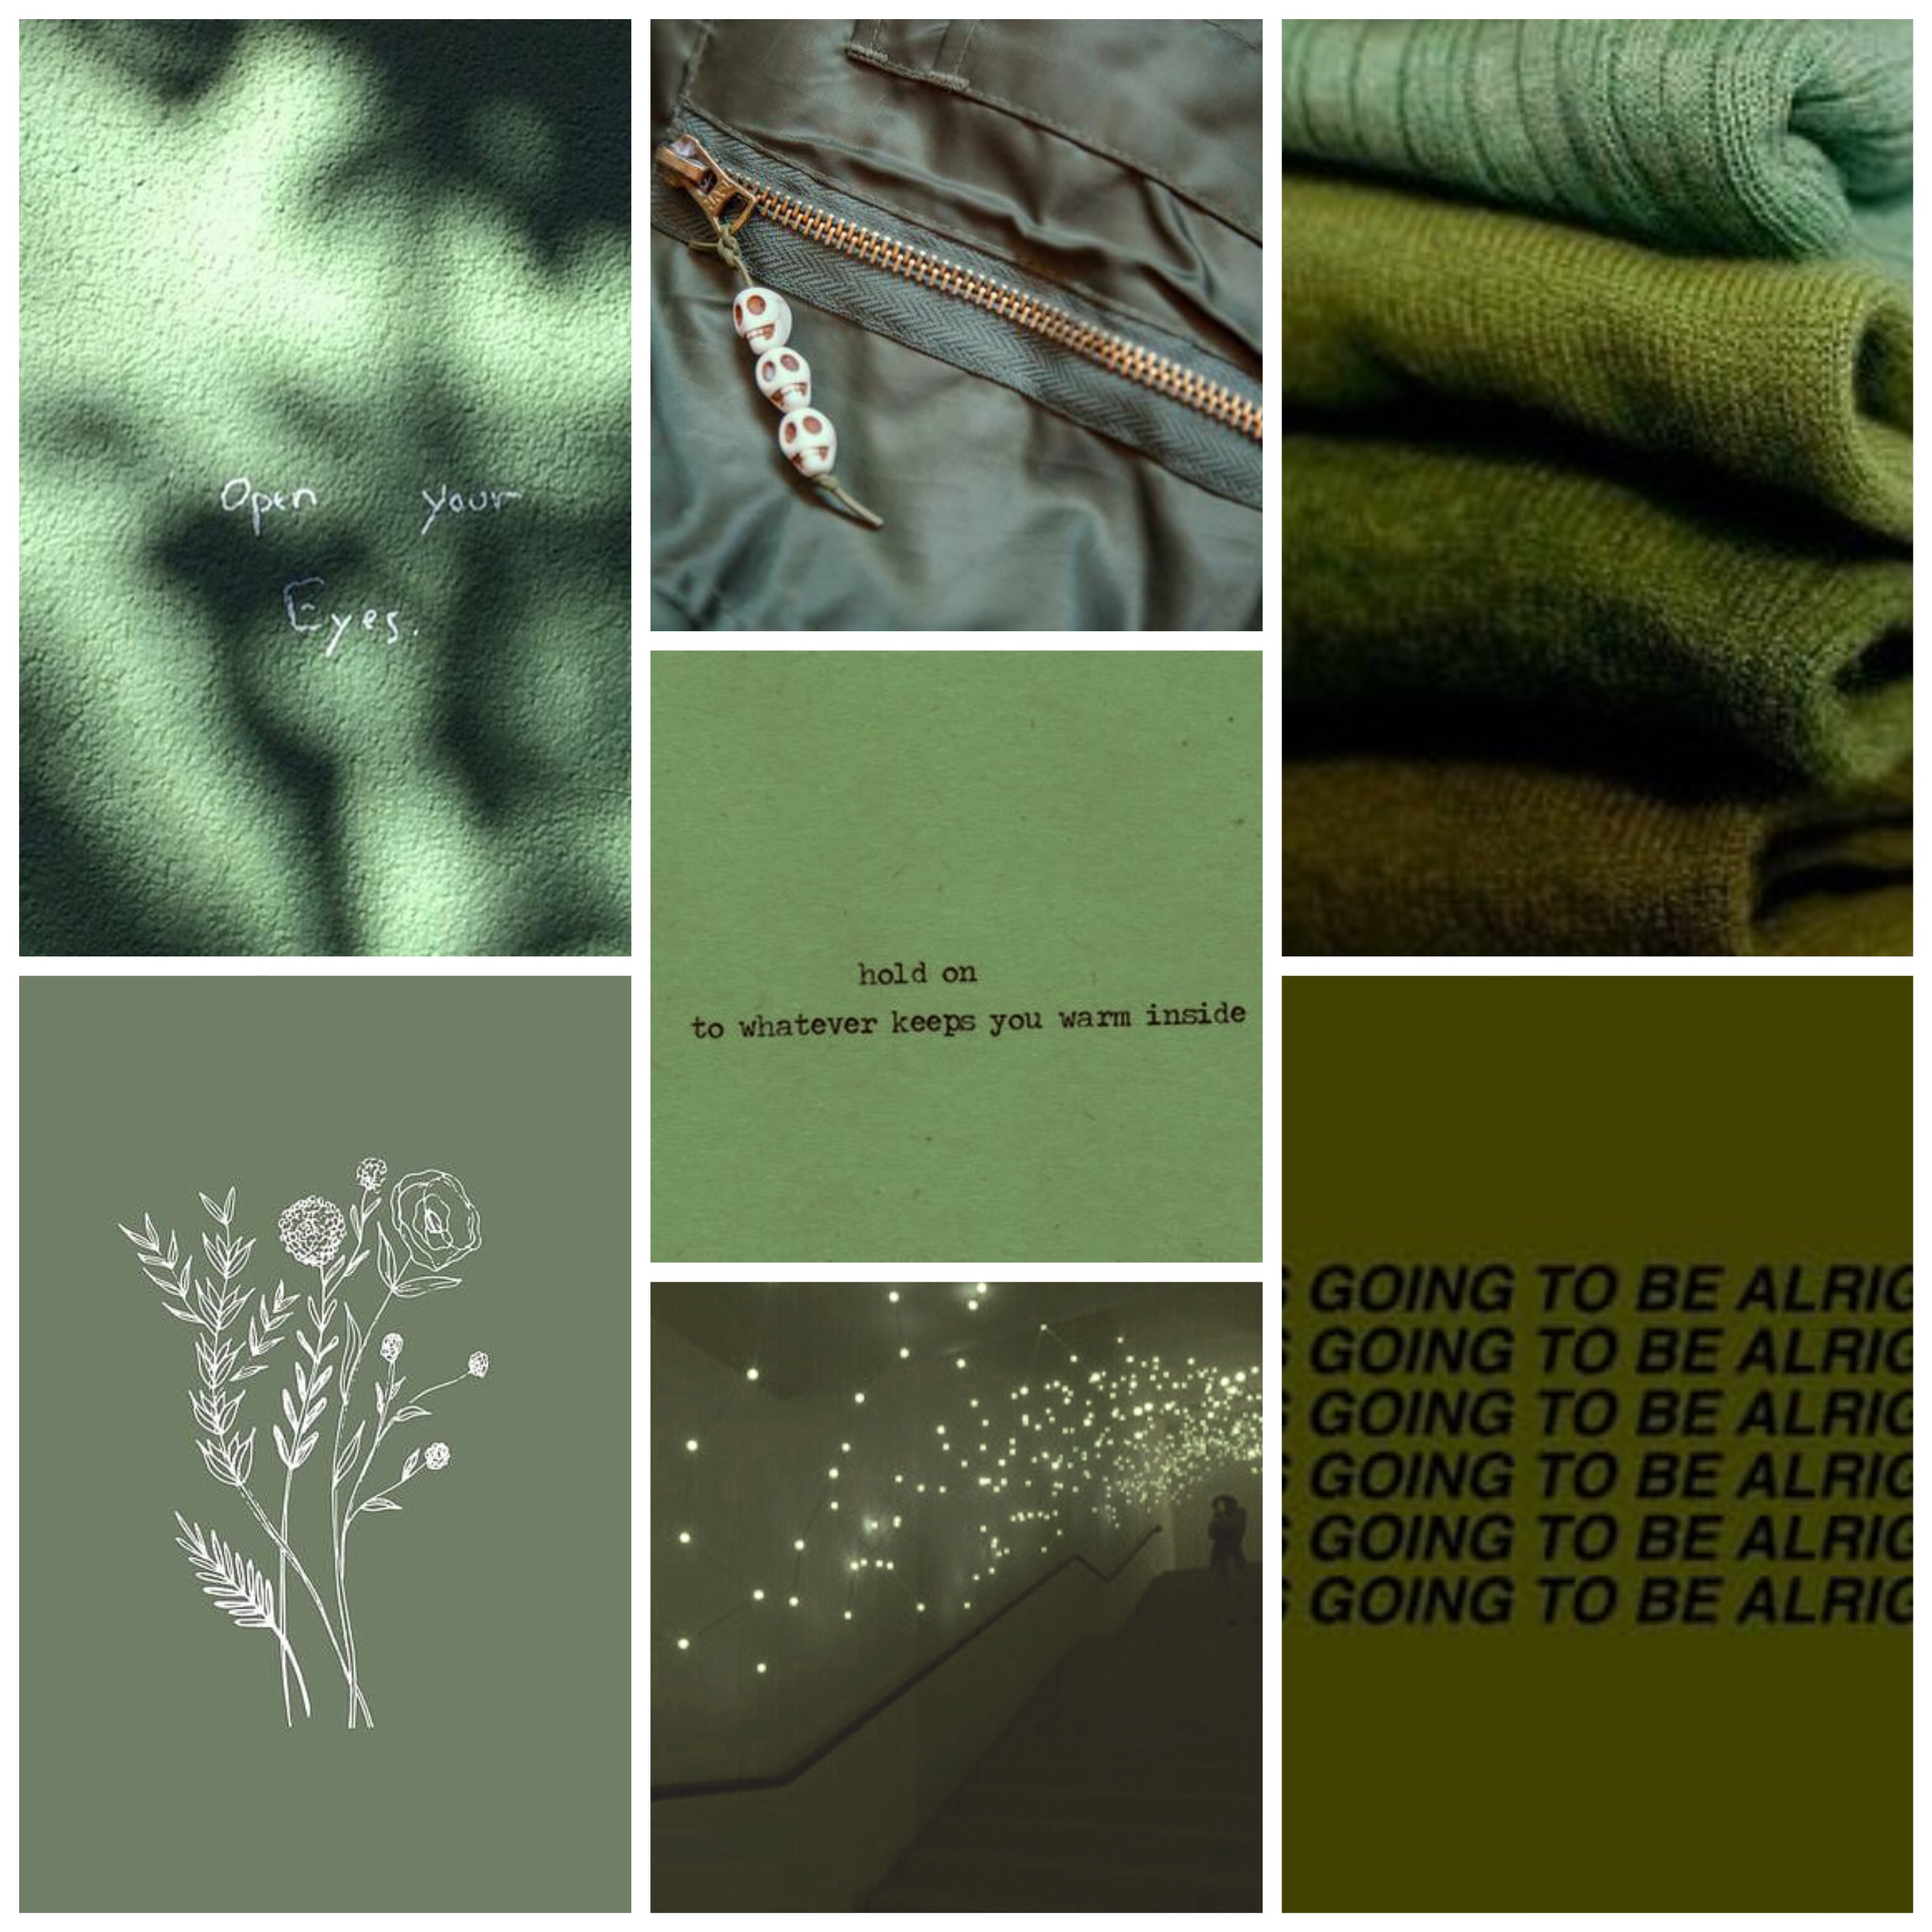 Olive Green aestethic #olivegreen #green #aestethic #greenaesthetic #olive #olivegreenaestethic #rainyday